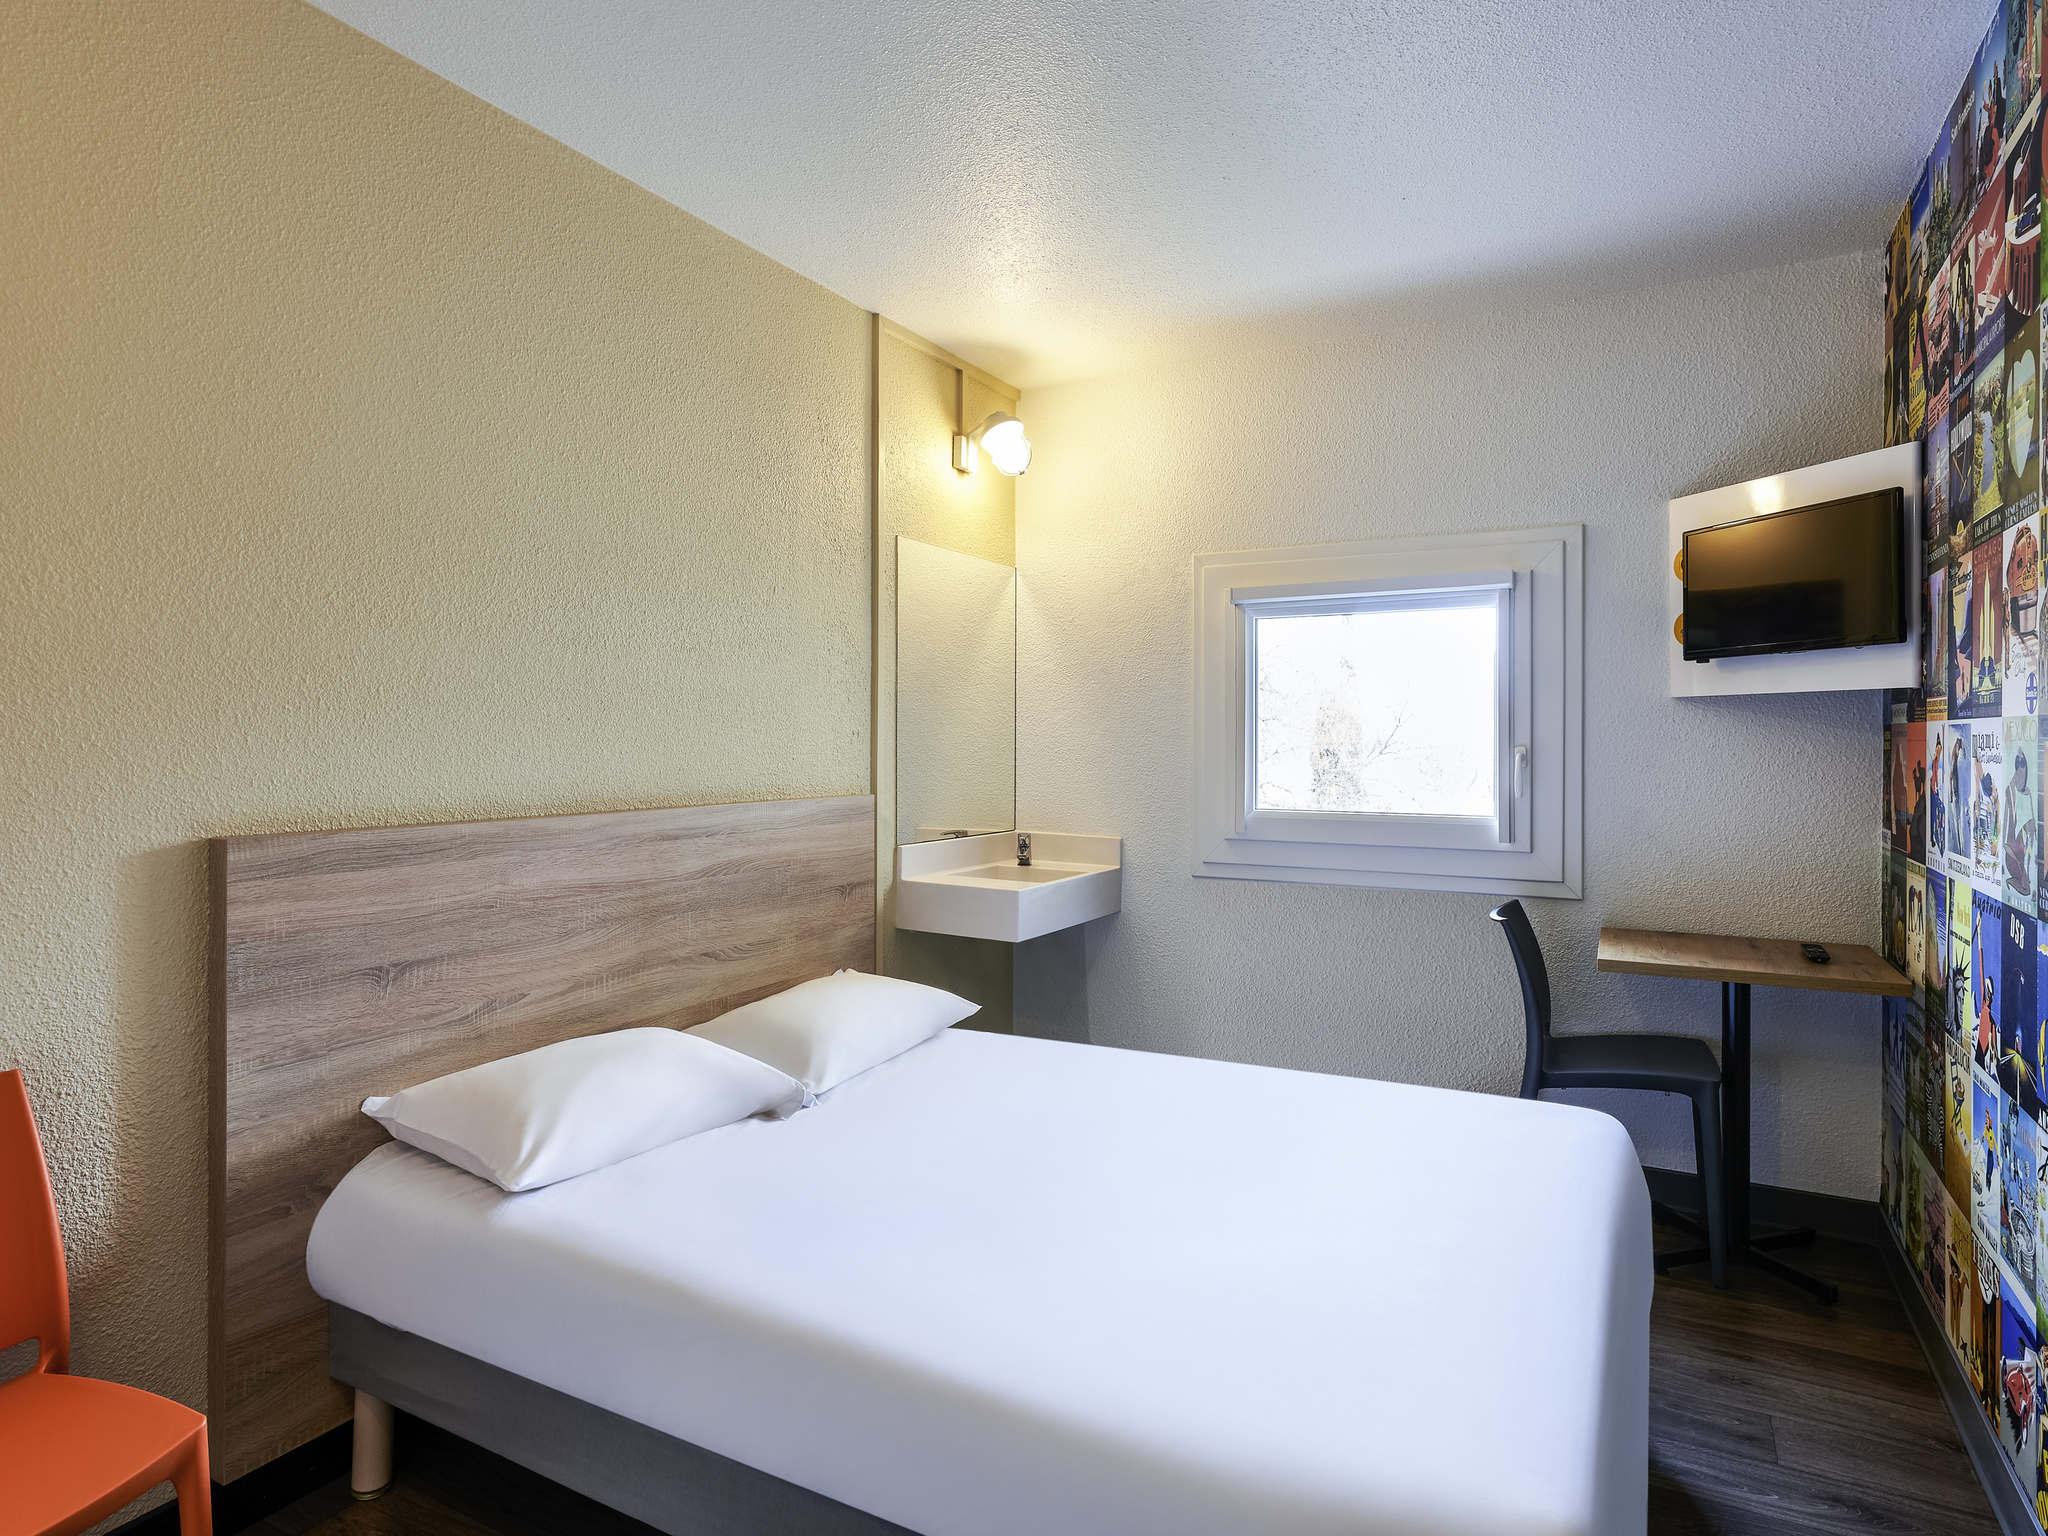 h tel paris hotelf1 paris porte de ch tillon r nov. Black Bedroom Furniture Sets. Home Design Ideas